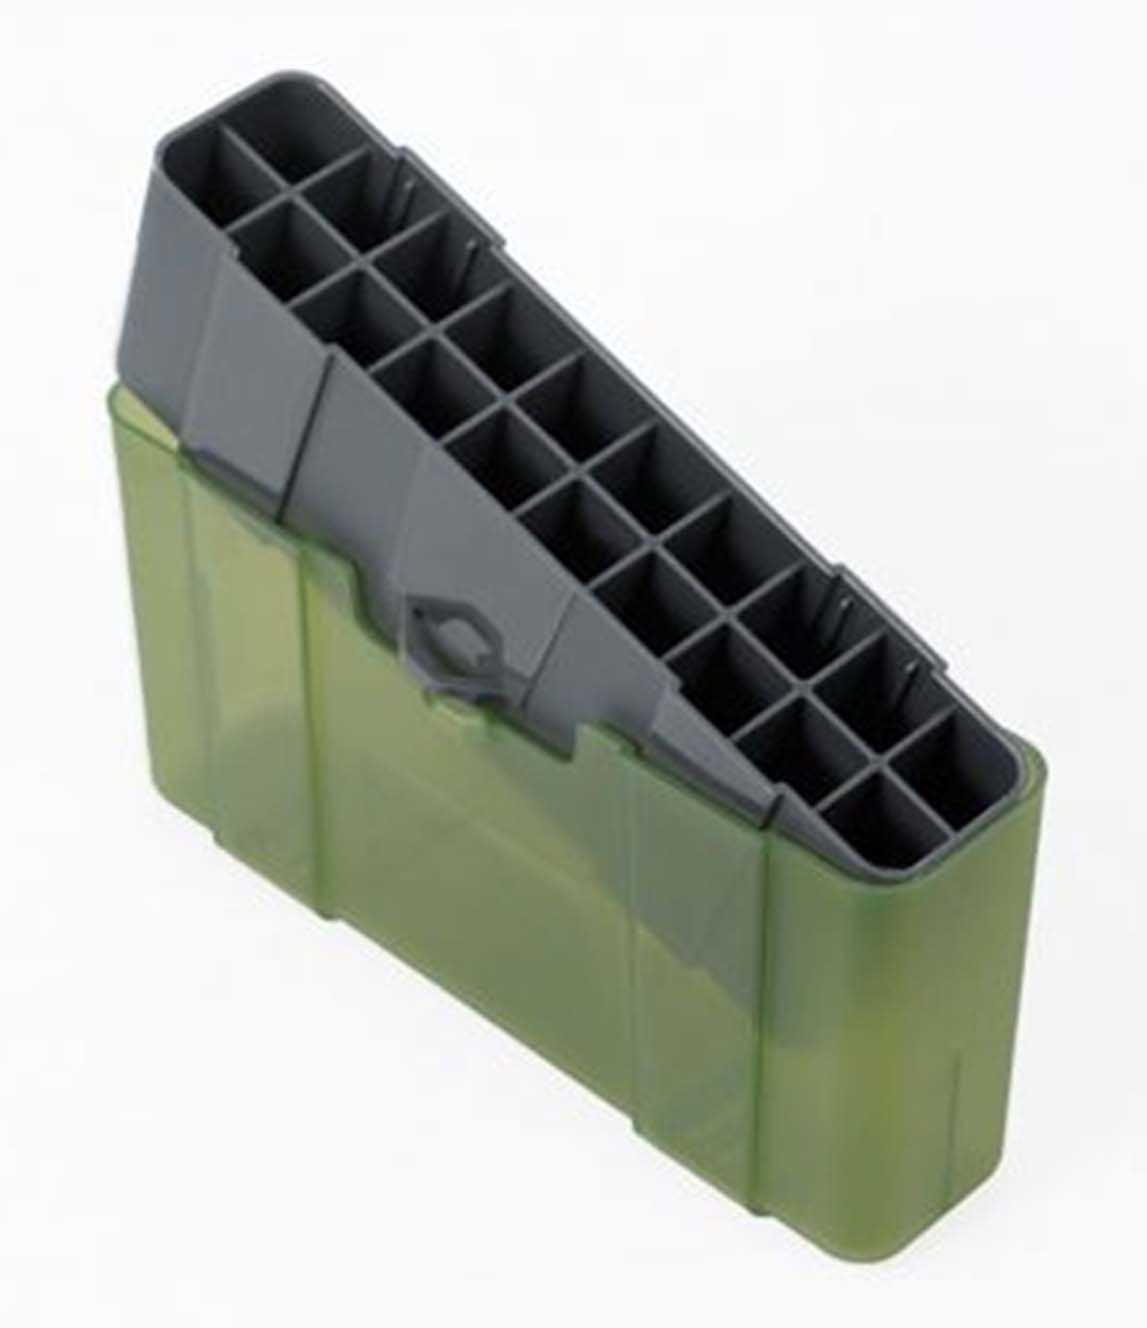 Plano Ammo Box Medium Rifle 20-RNDS Slip Top 6Pk Case LOTS